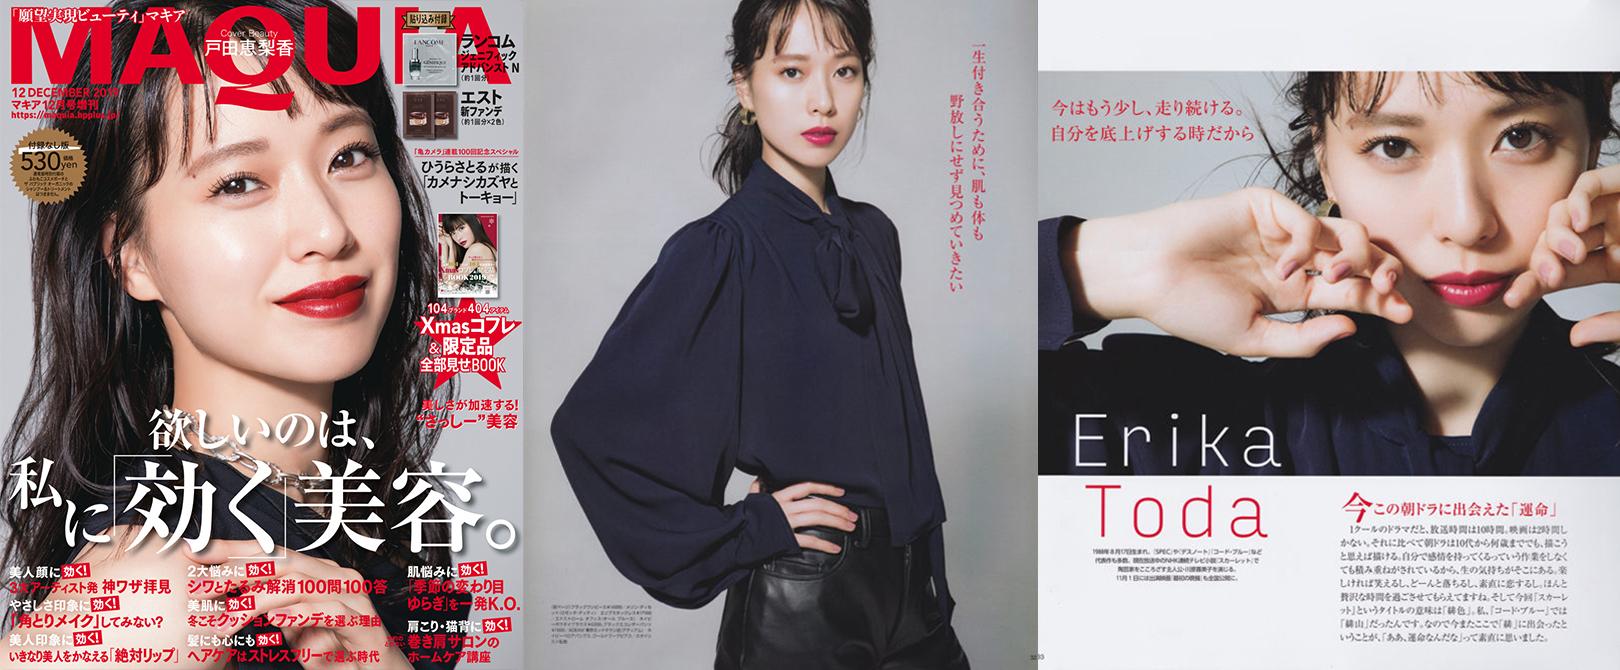 MAQUIA 2019 12月号 / Cover